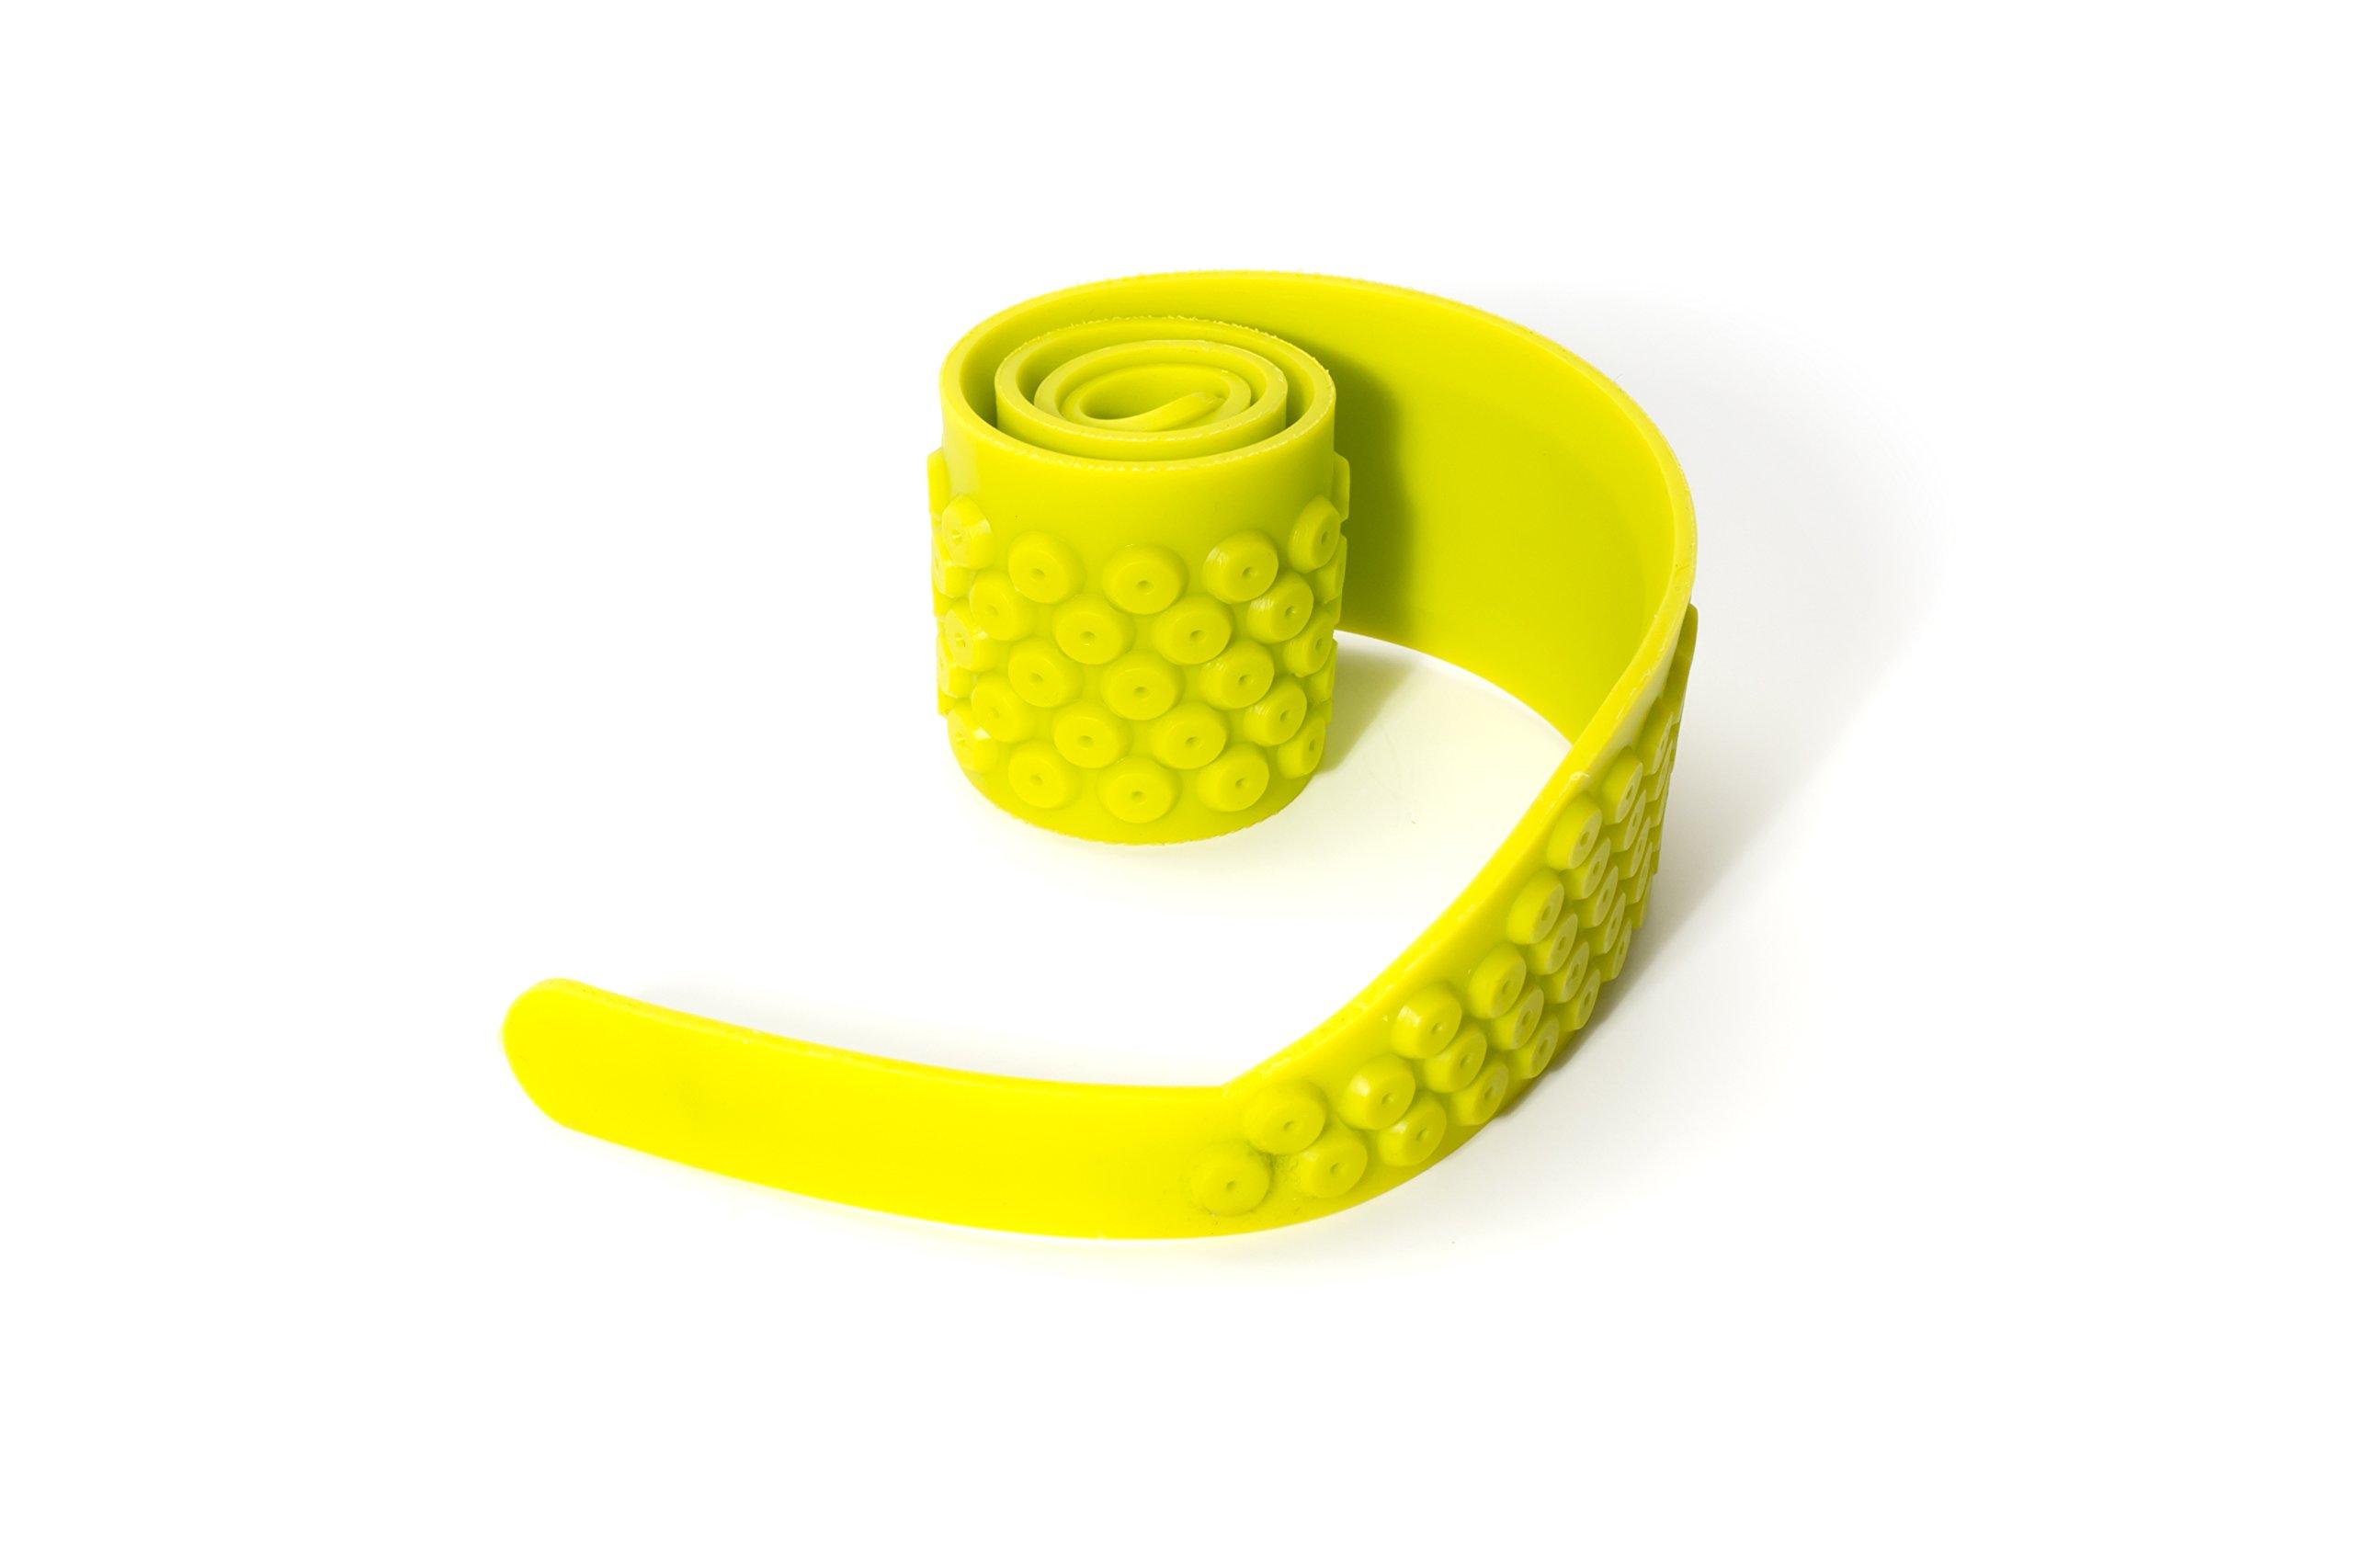 "Limbsaver Comfort-Tech 24023 Hand Tool Grip Wrap, 16"", Yellow"